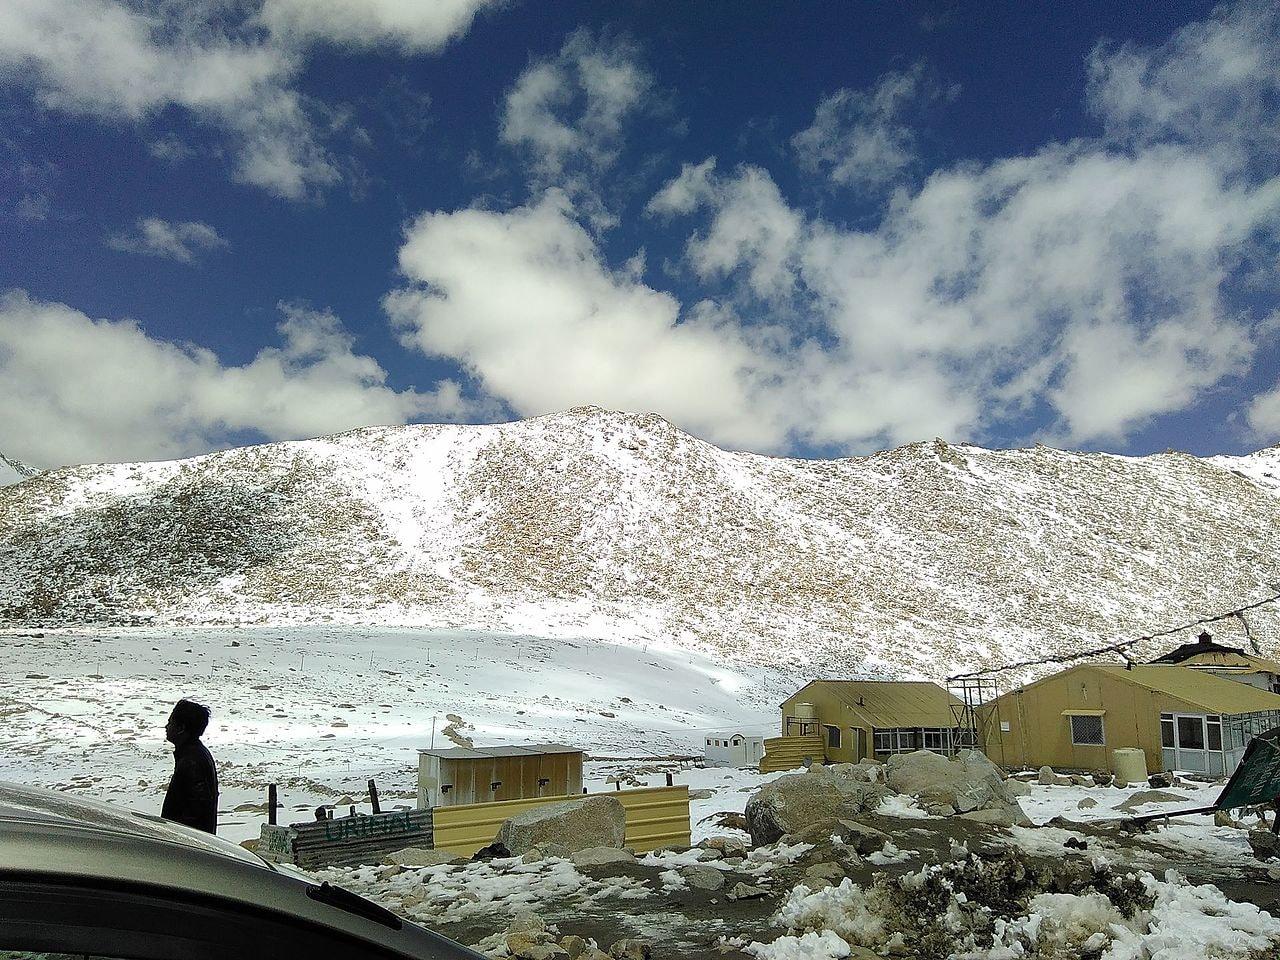 Ice_mountains_at_leh_ladakh